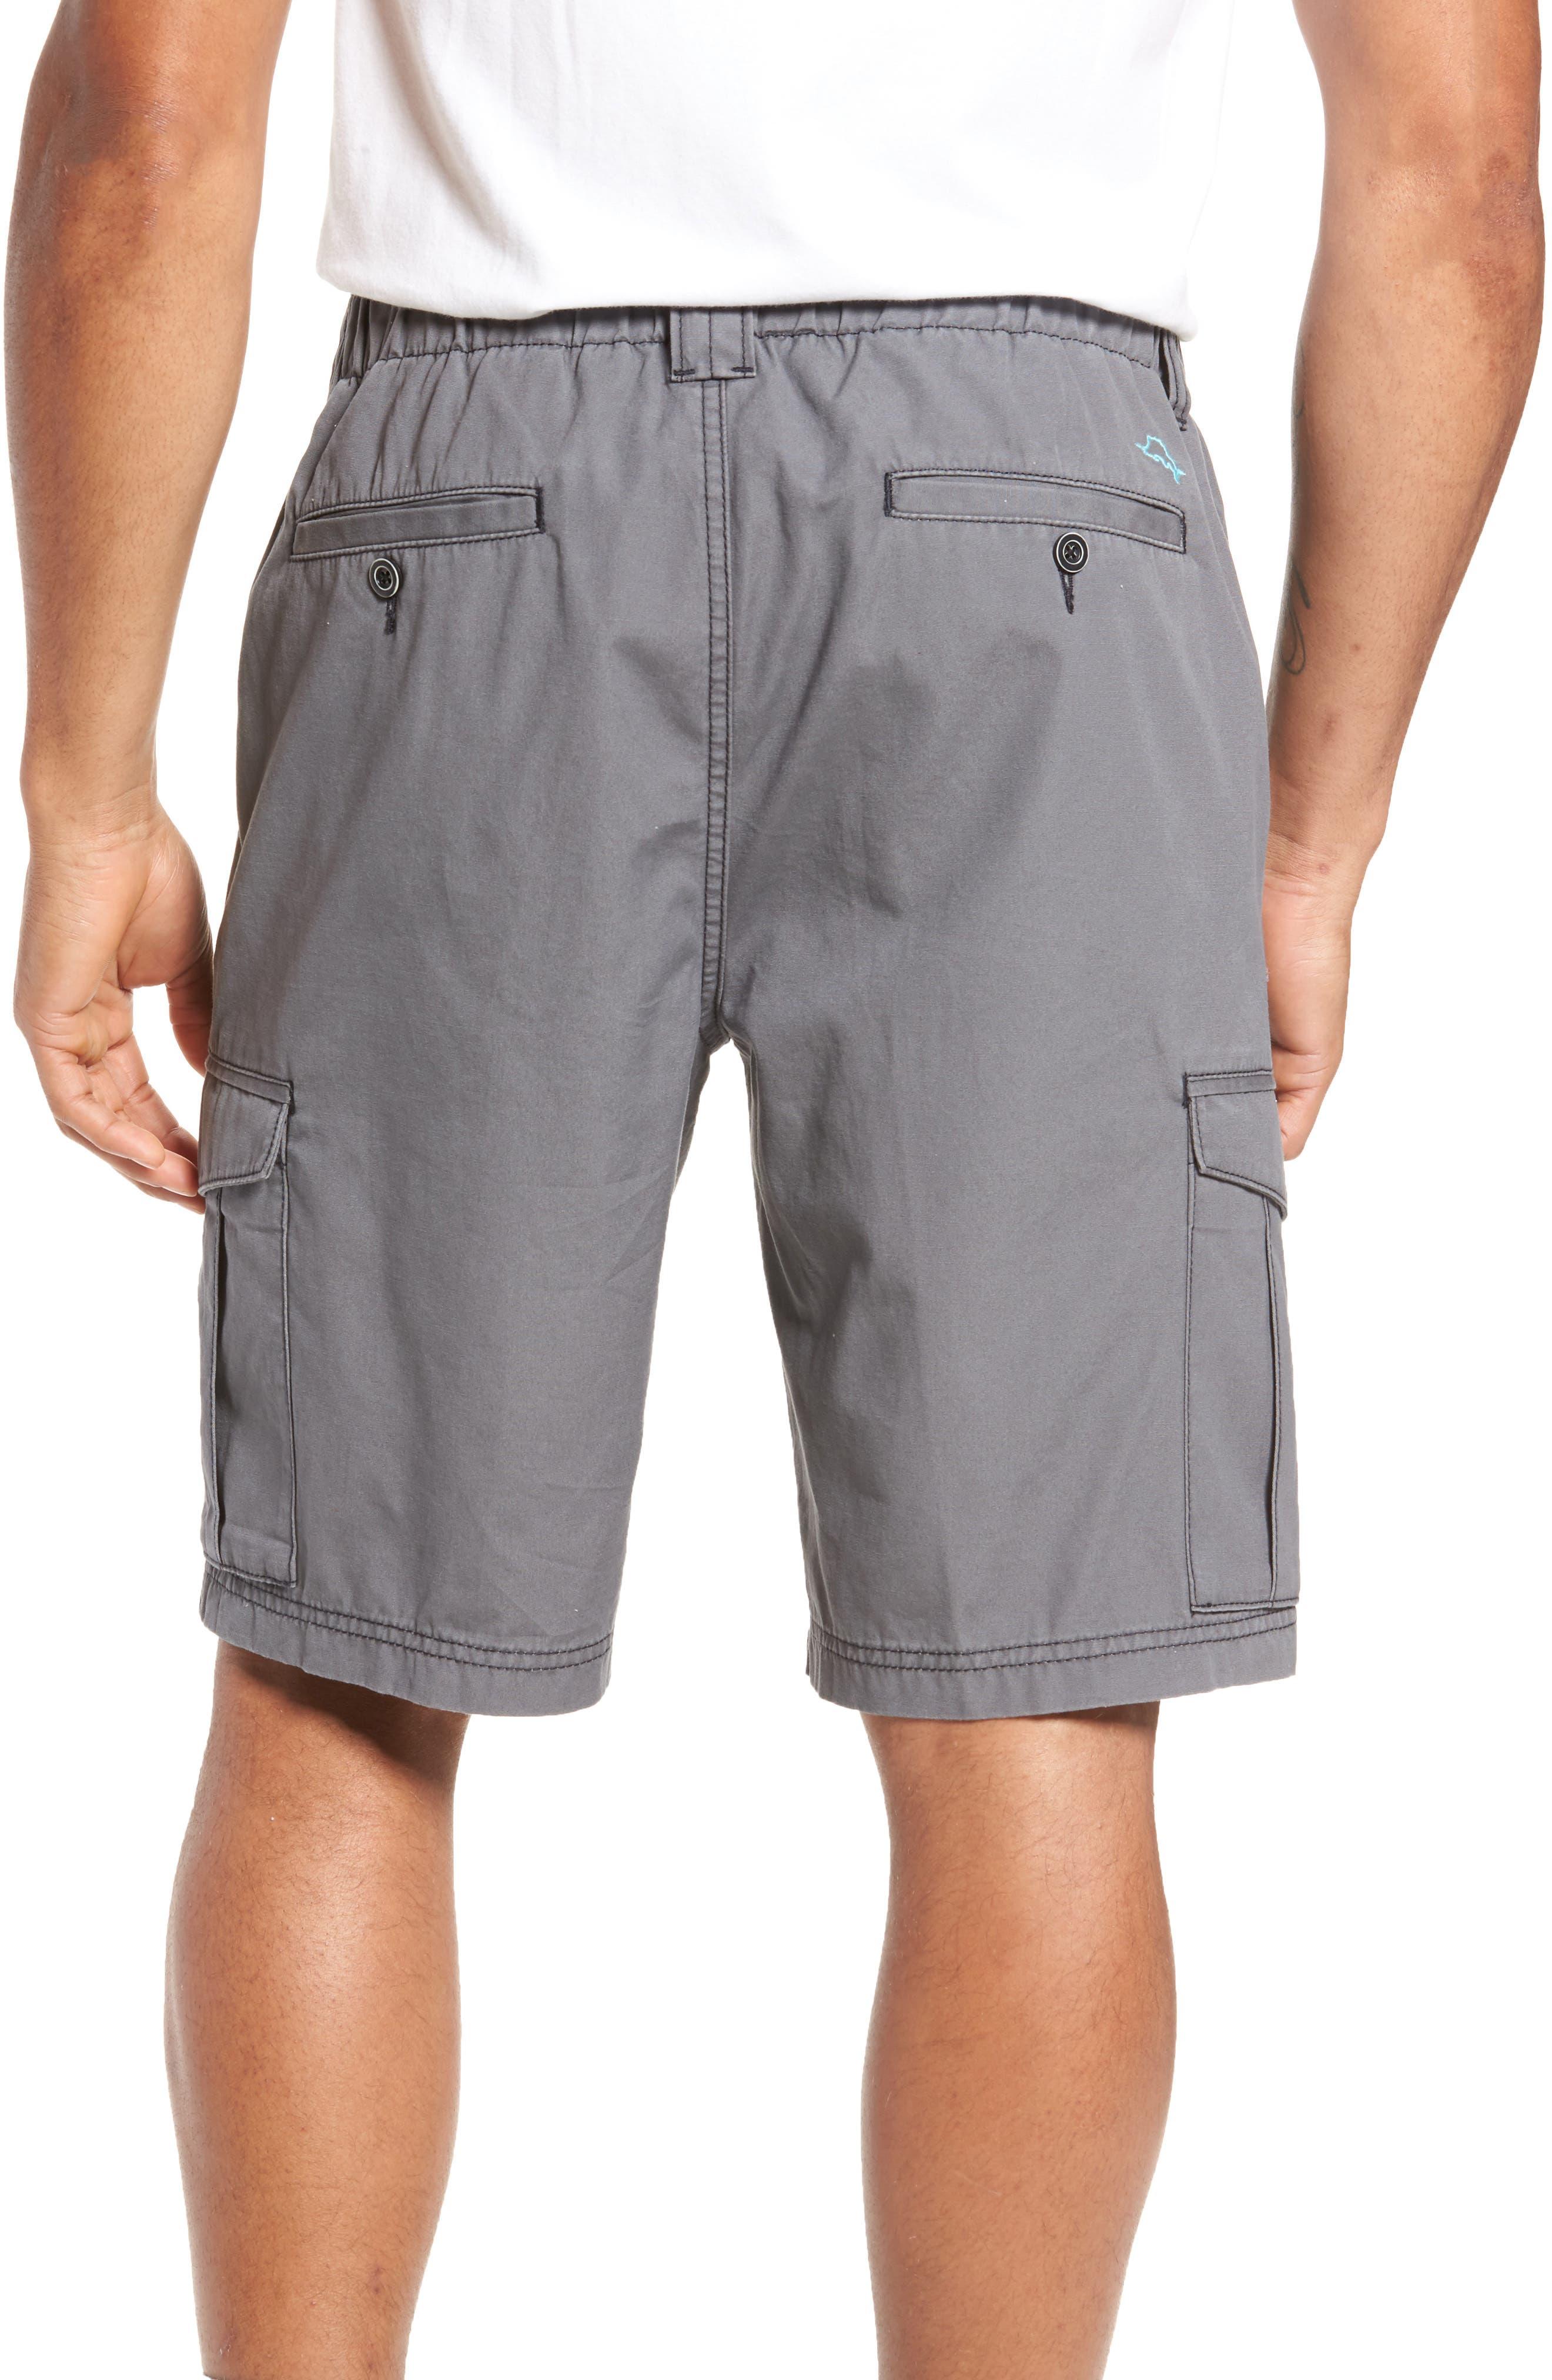 Island Survivalist Cargo Shorts,                             Alternate thumbnail 2, color,                             050